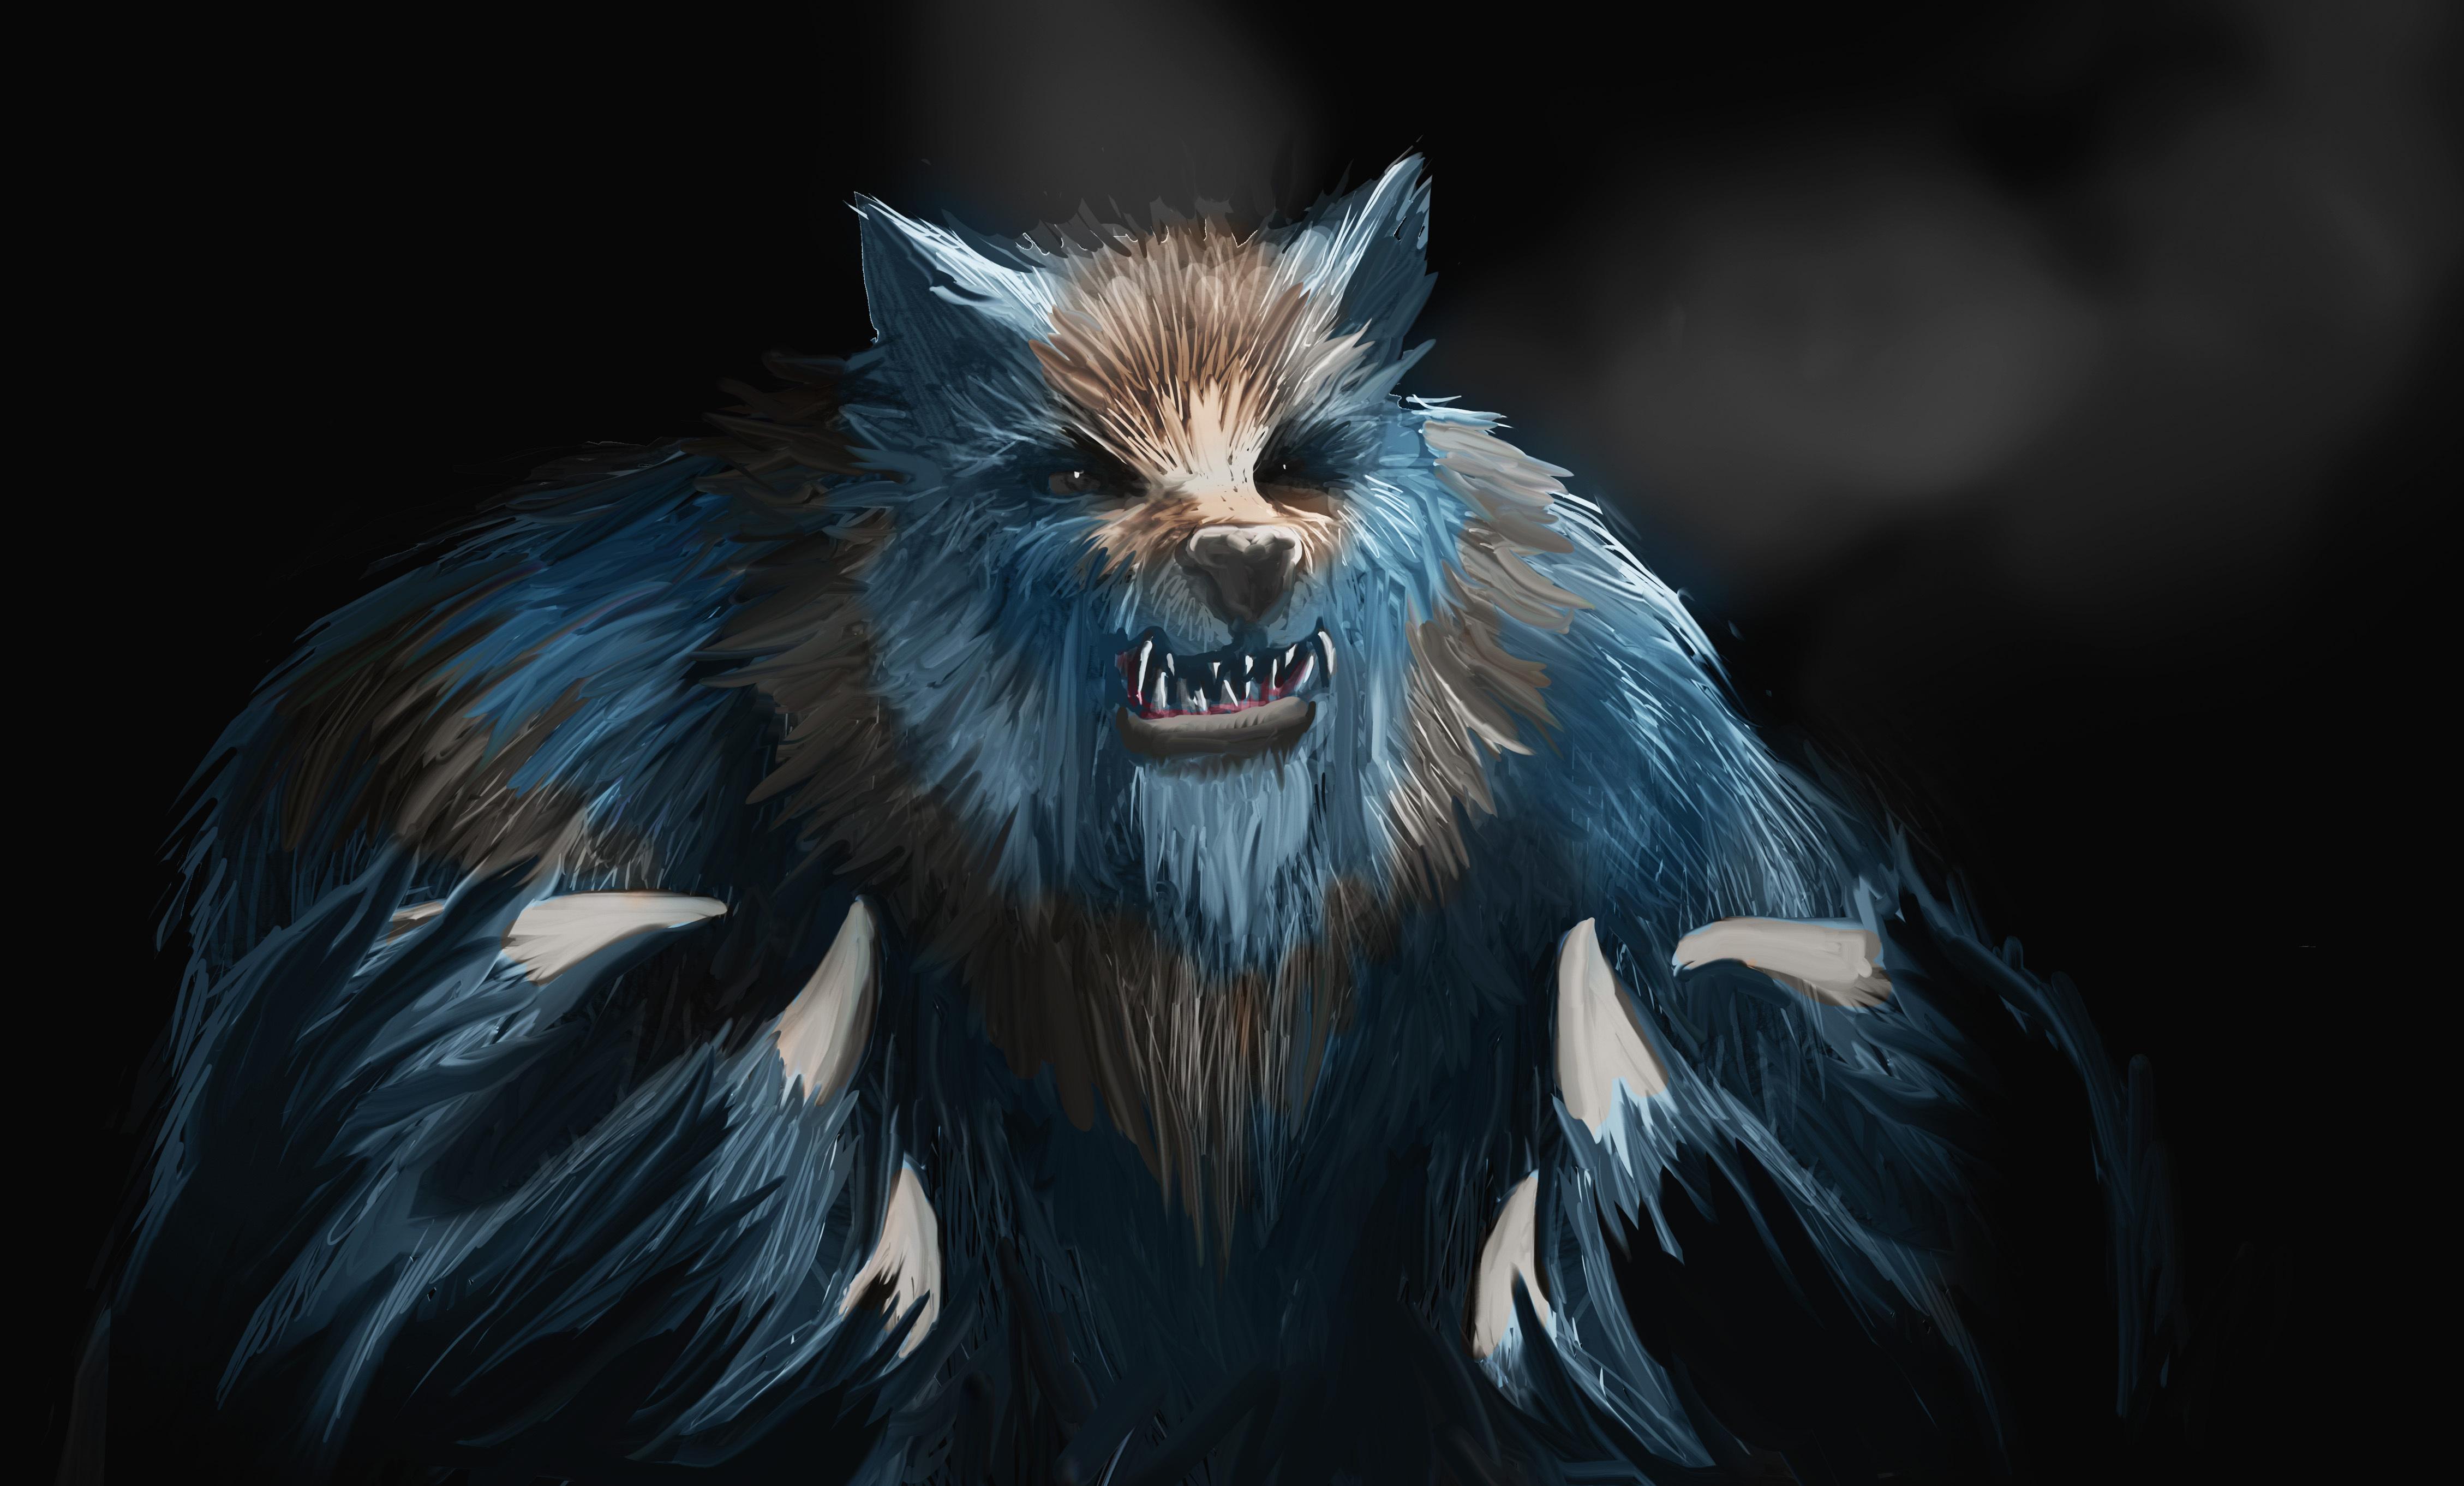 Werewolf 4k Ultra HD Wallpaper and Background | 4516x2723 ...